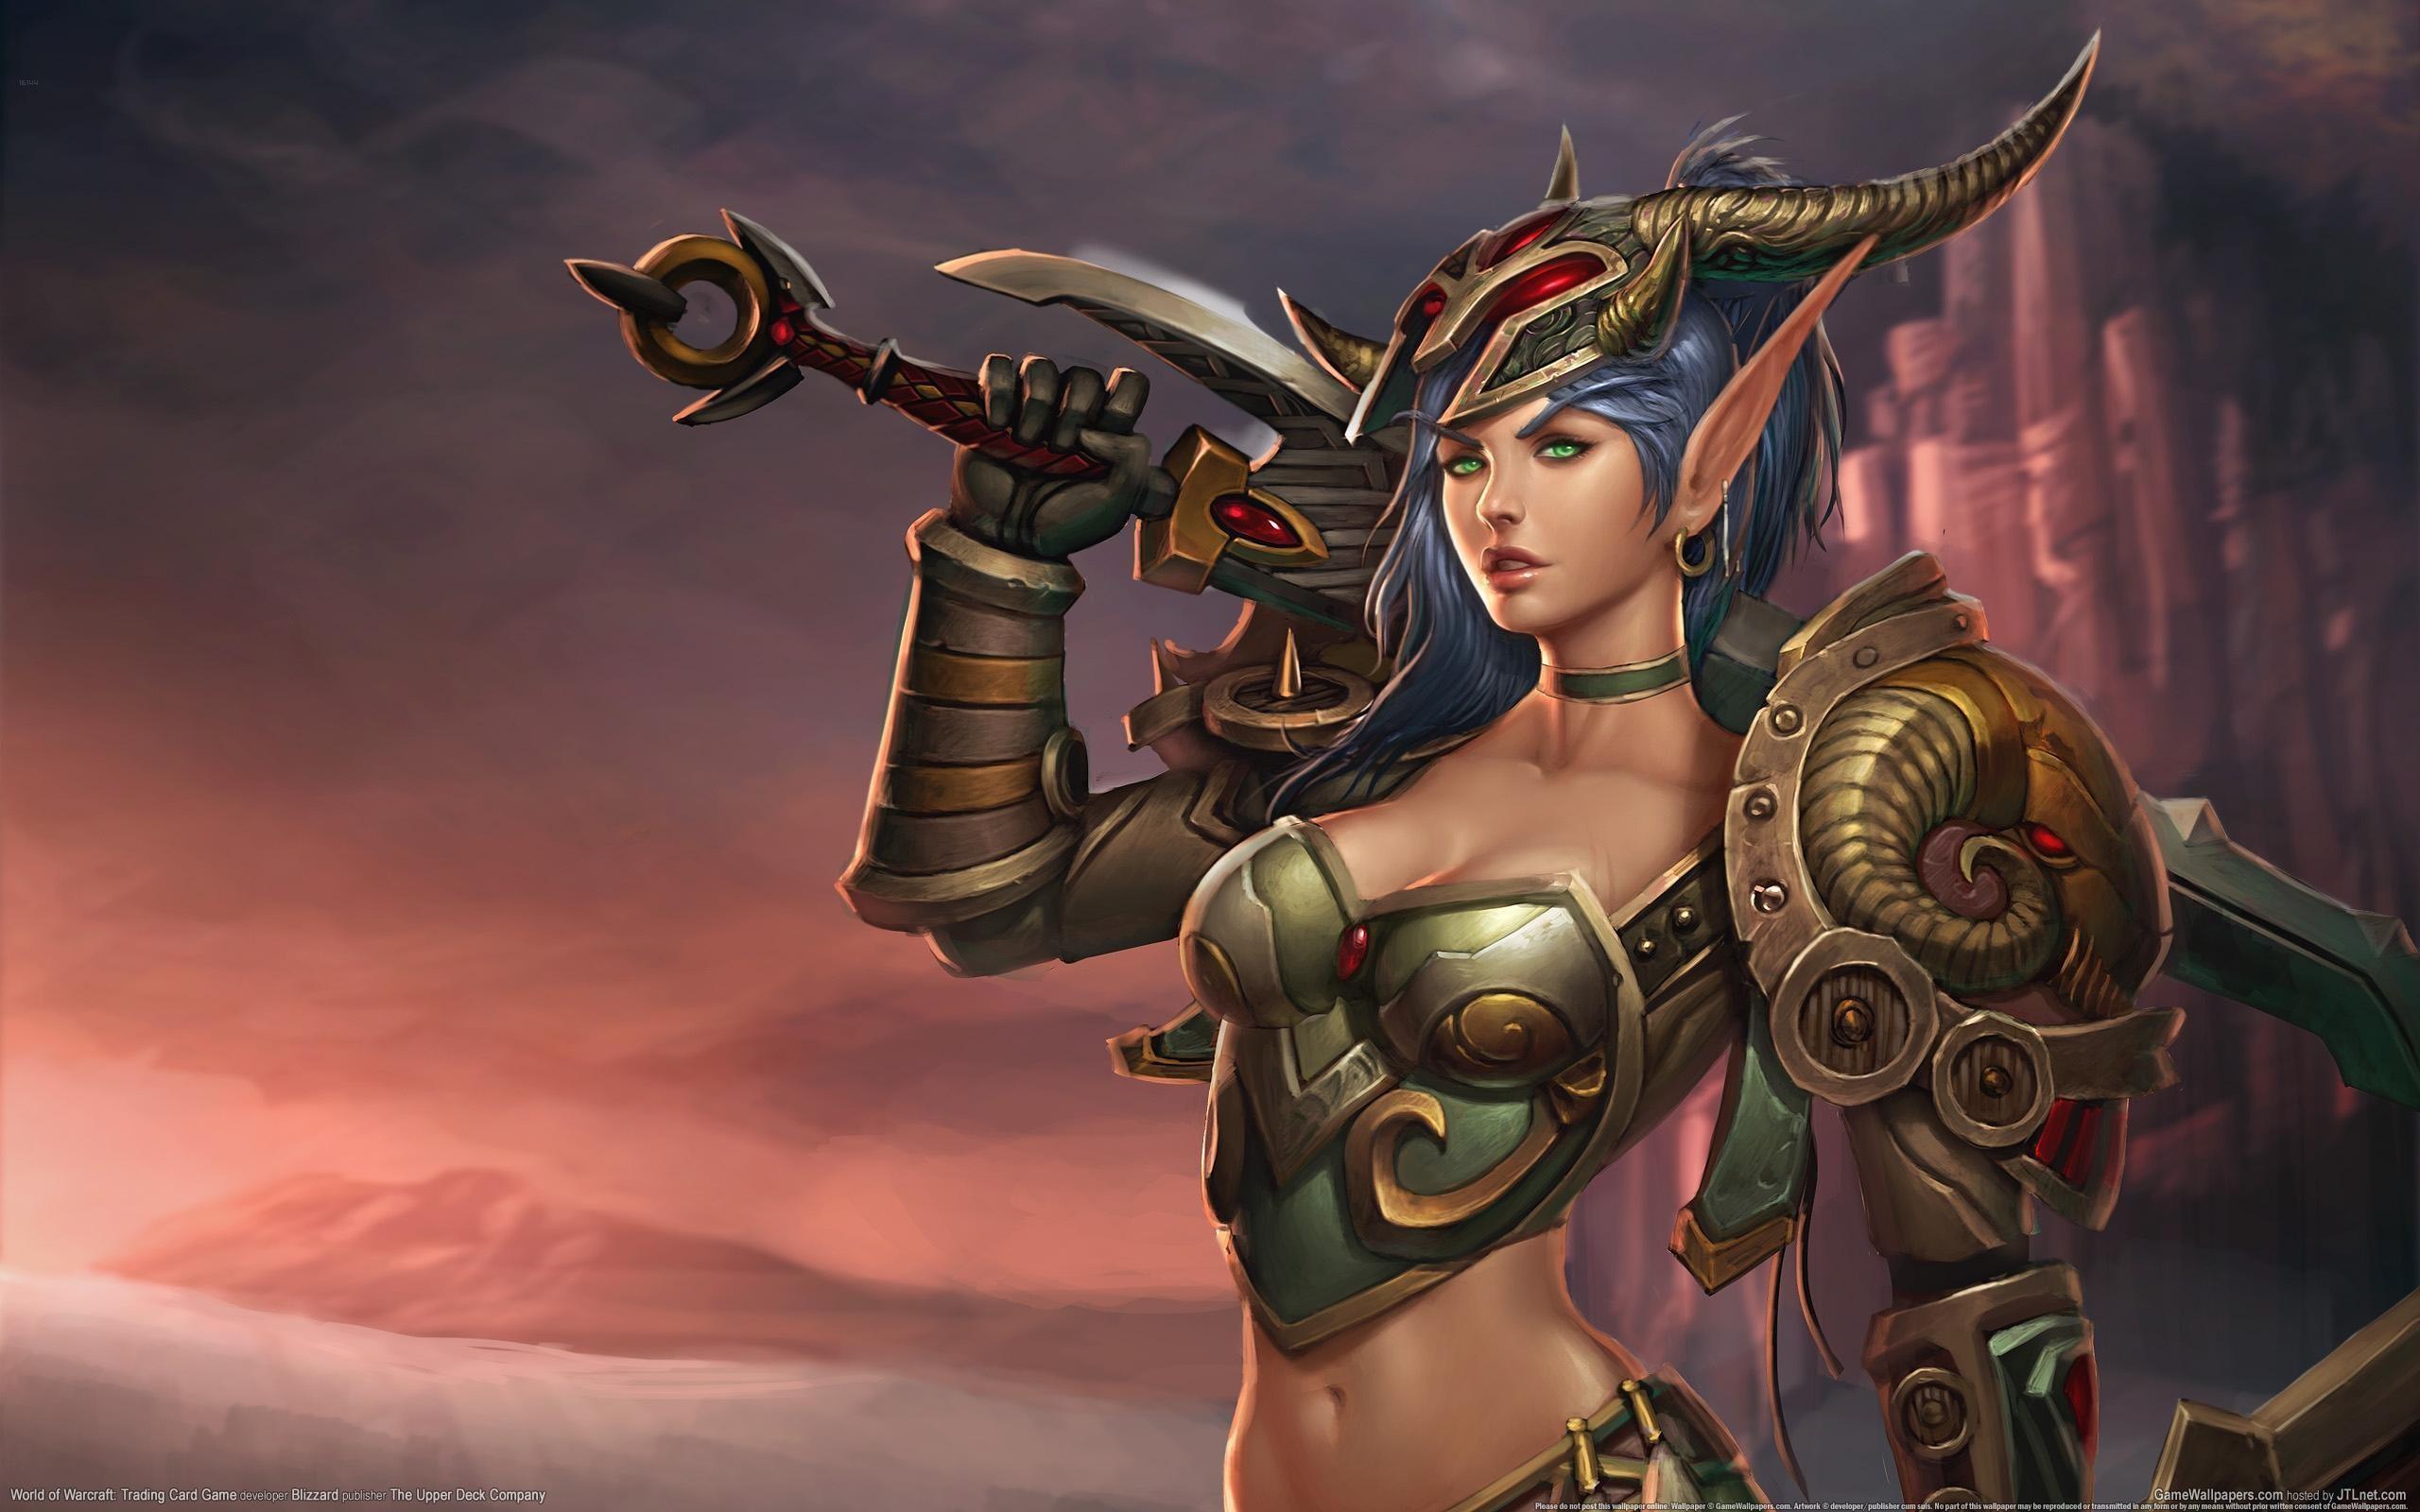 General 2560x1600 Warcraft World of Warcraft: Trading Card Game big boobs helmet cleavage fantasy girl World of Warcraft